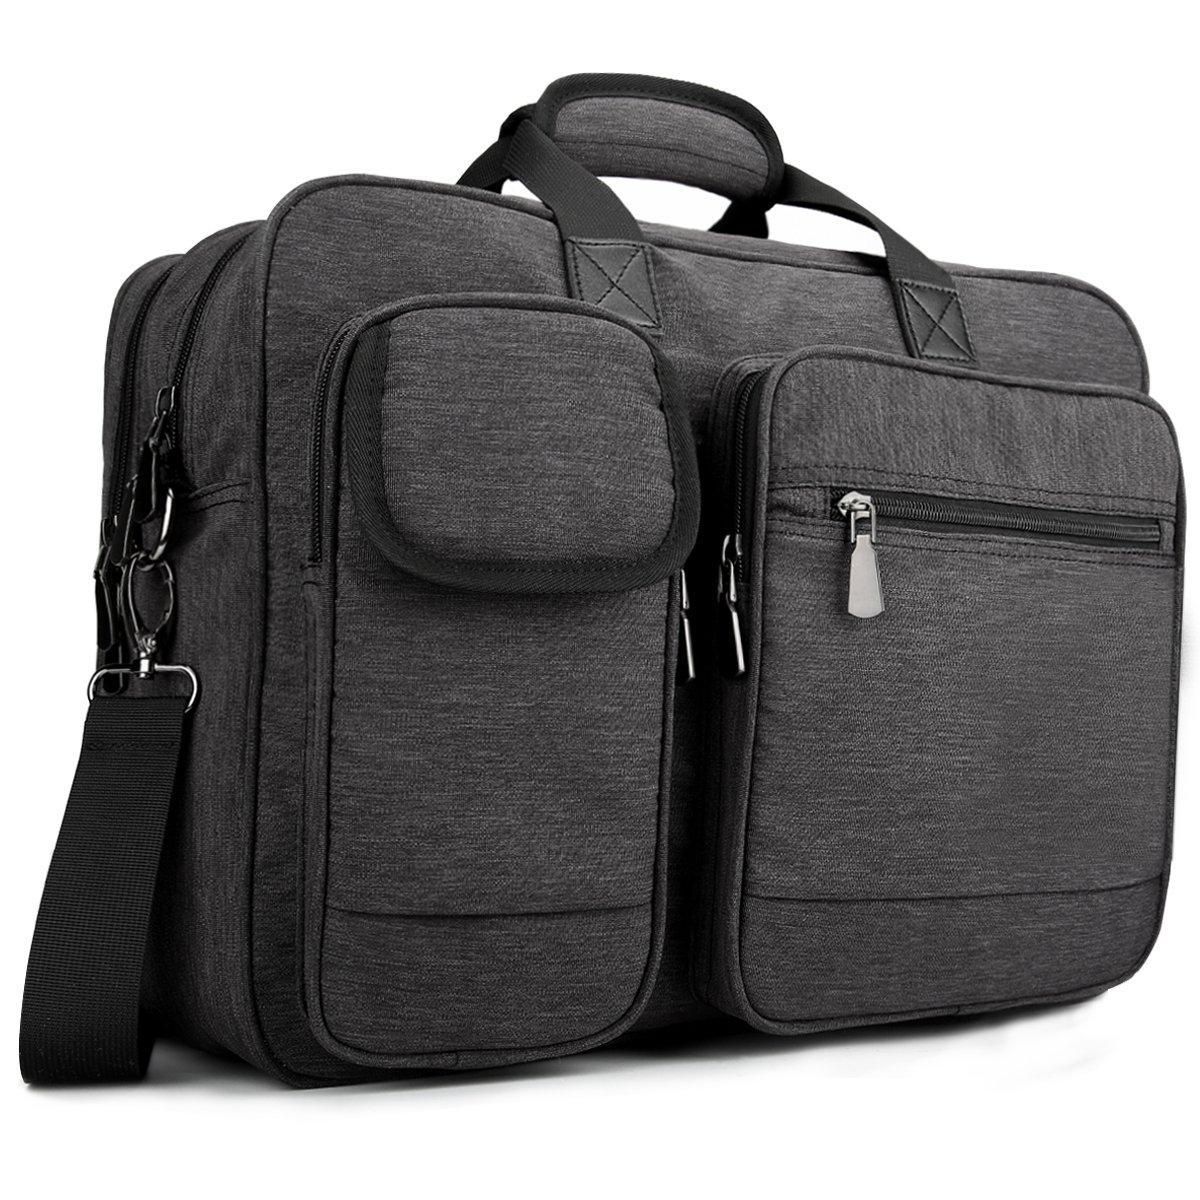 Tocode Laptop Messenger Bag 17.3 inch Multi-functional Protective Tote Business Briefcase, Padded Shoulder Strap Carrying Handbag for Men & Women